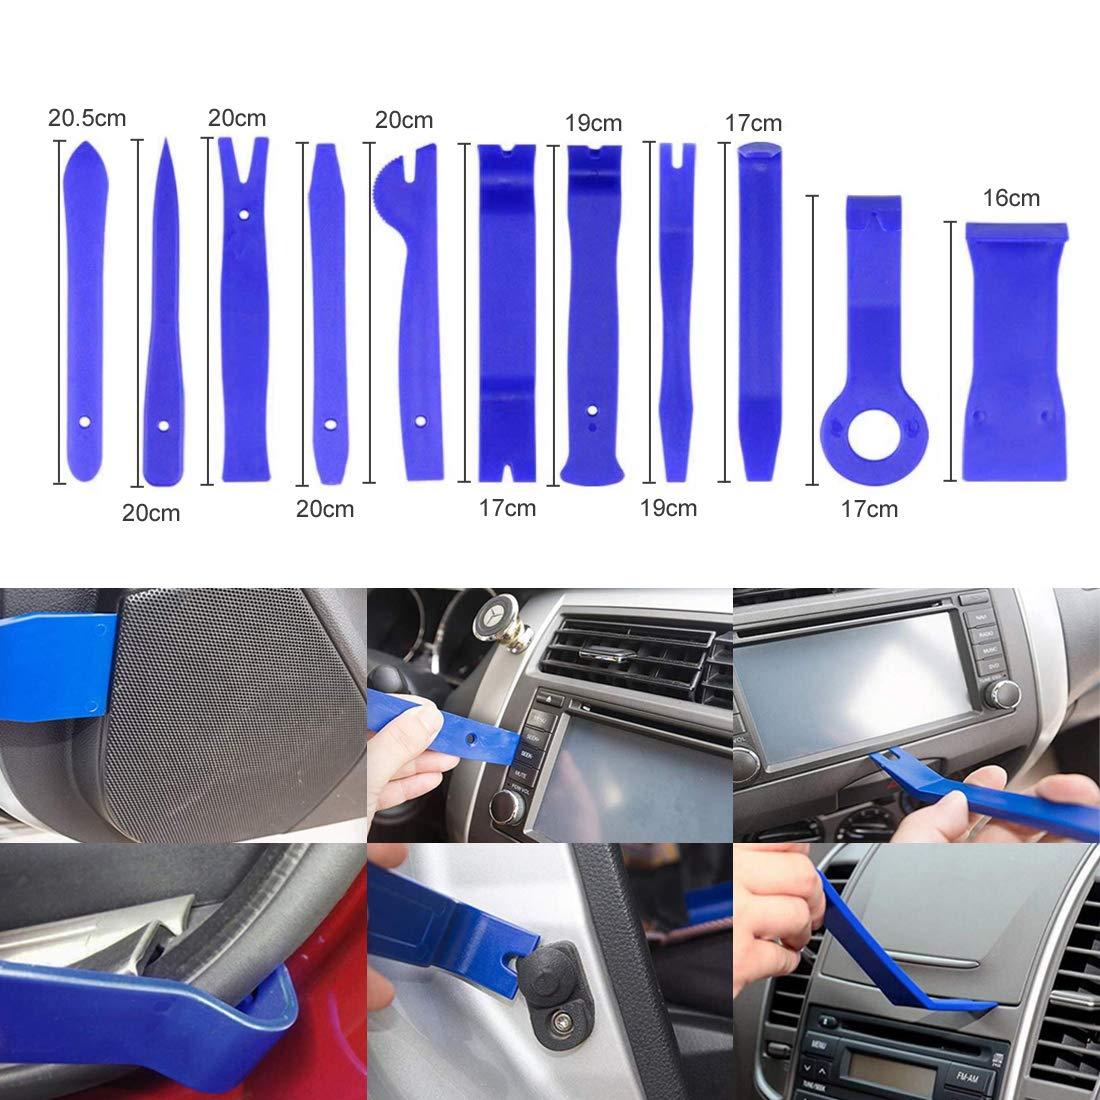 UTSAUTO 37Pcs Auto Audio Trim Removal Tool Set Car Panel Door Audio Trim Removal Install Tool Kit with Storage Bag